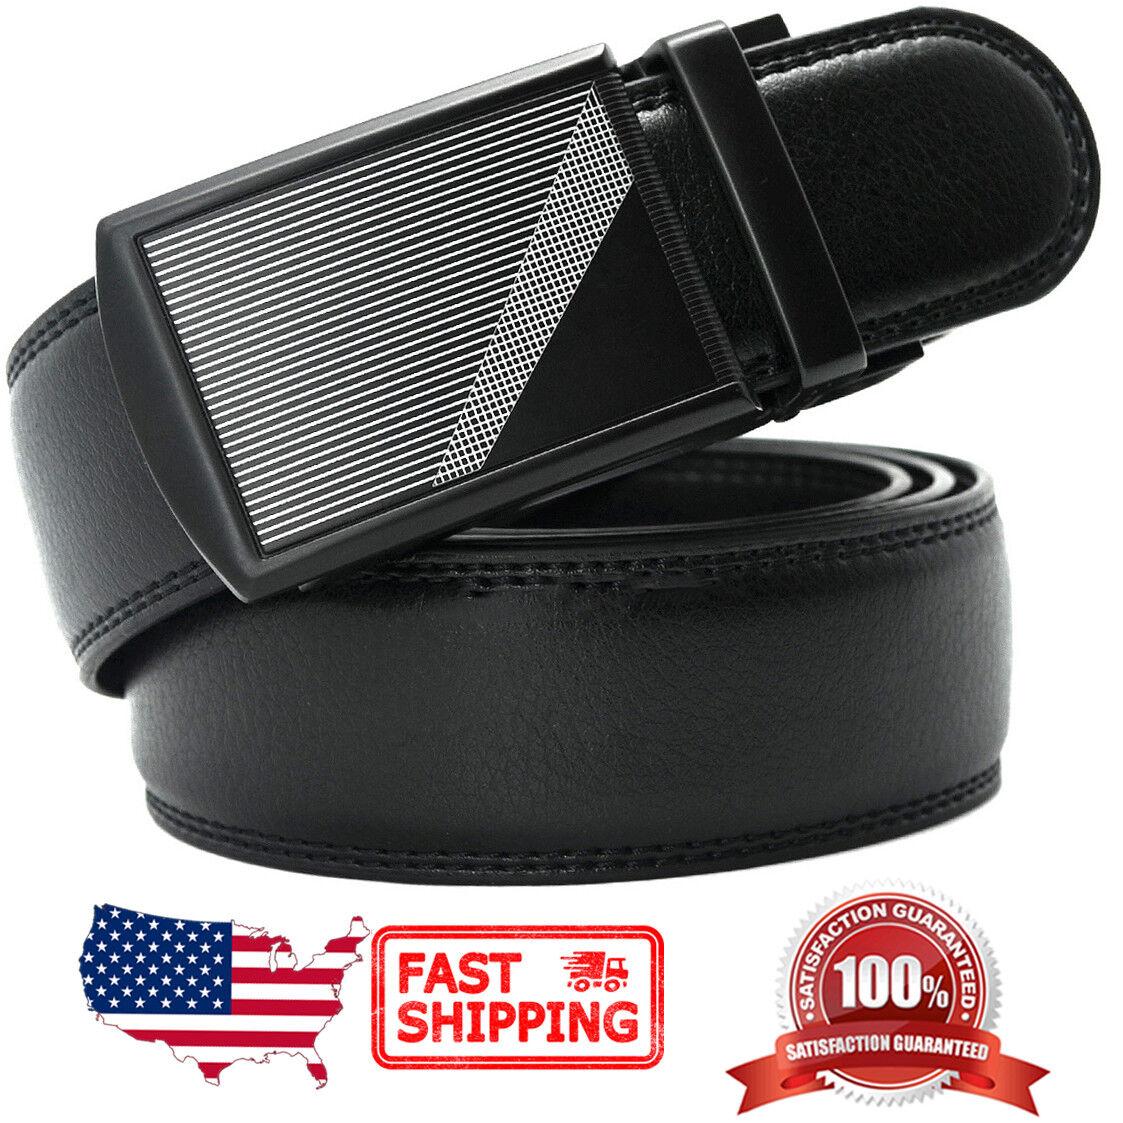 Men's Genuine Leather Adjustable Automatic Buckle Ratchet Dress Belt Belts